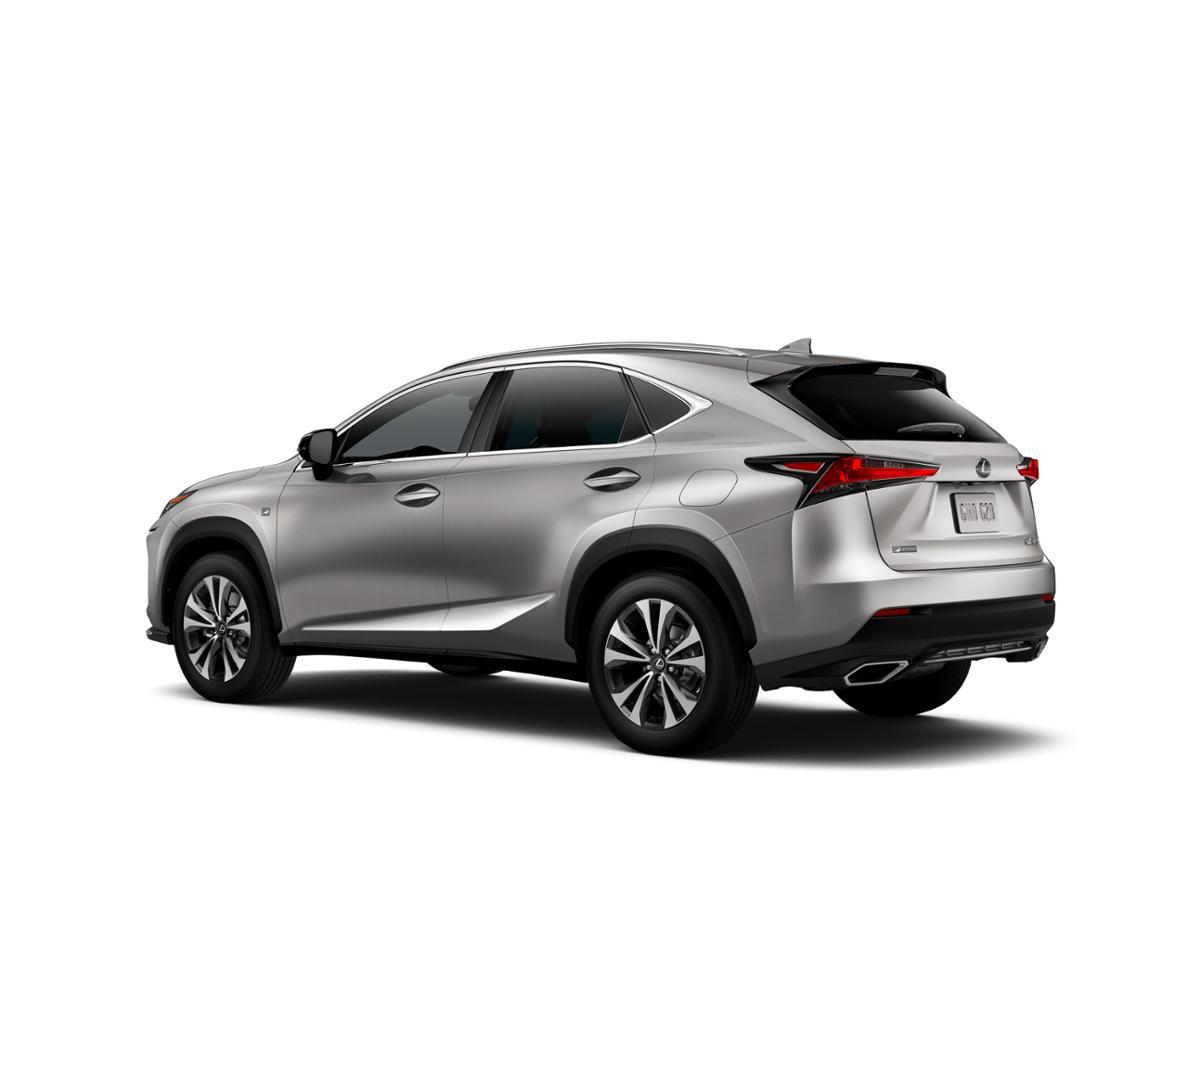 Lexus Nx Sport: New Atomic Silver 2020 Lexus NX 300 F SPORT In Cerritos